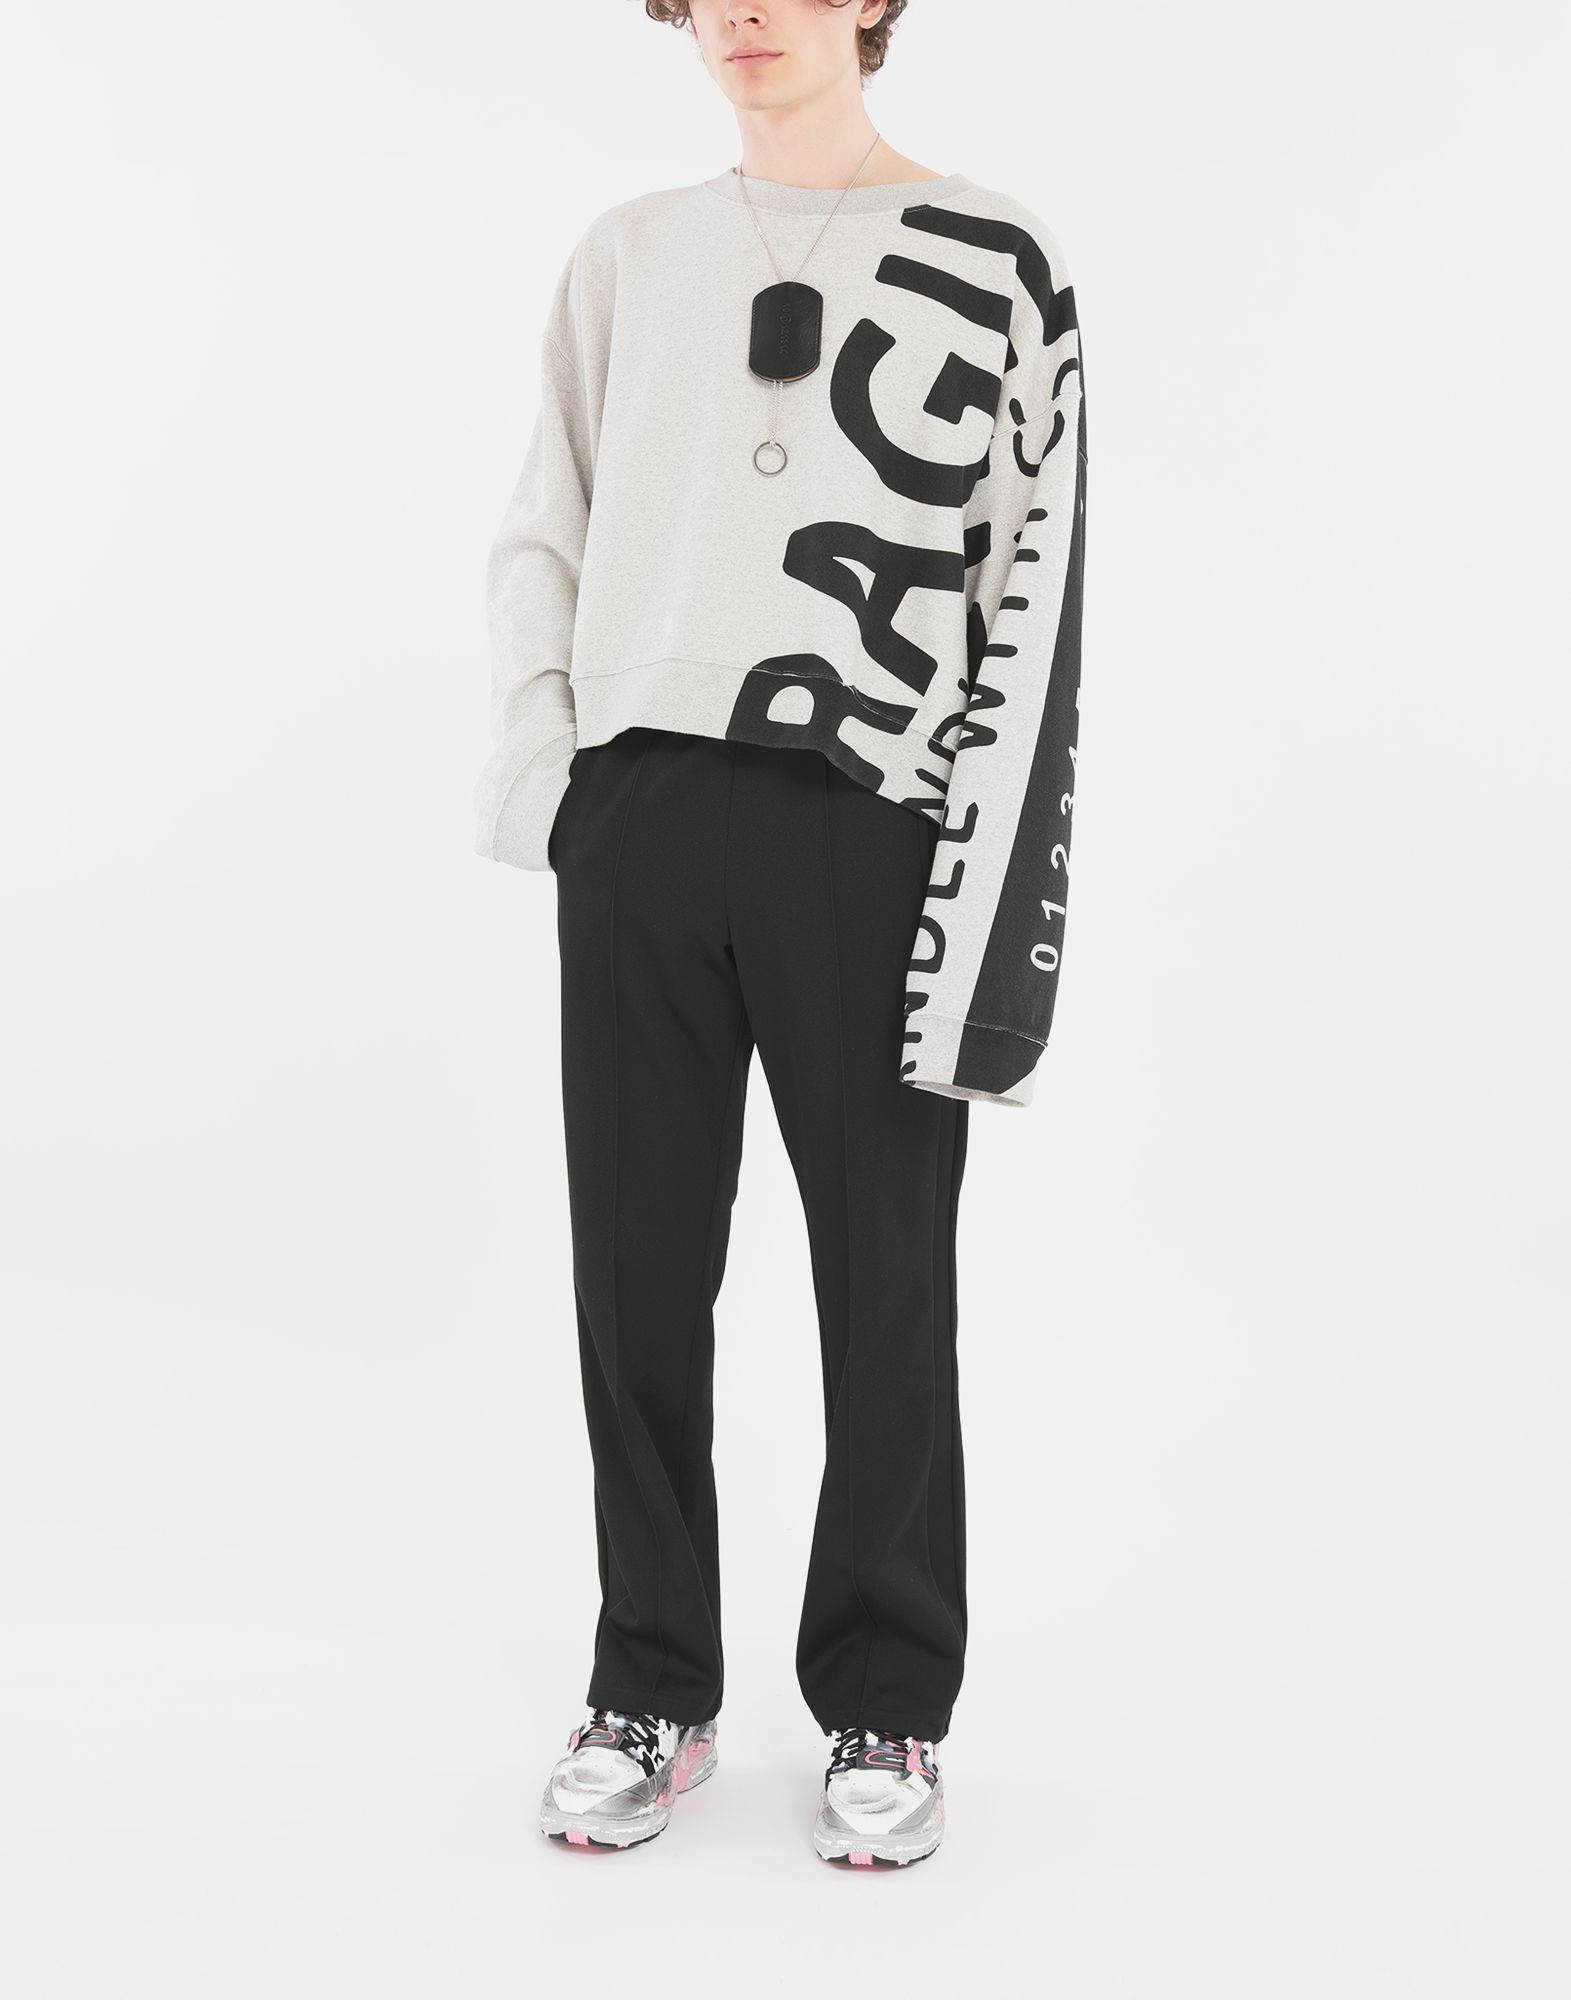 MAISON MARGIELA 'Fragile' sweatshirt Sweatshirt Man d